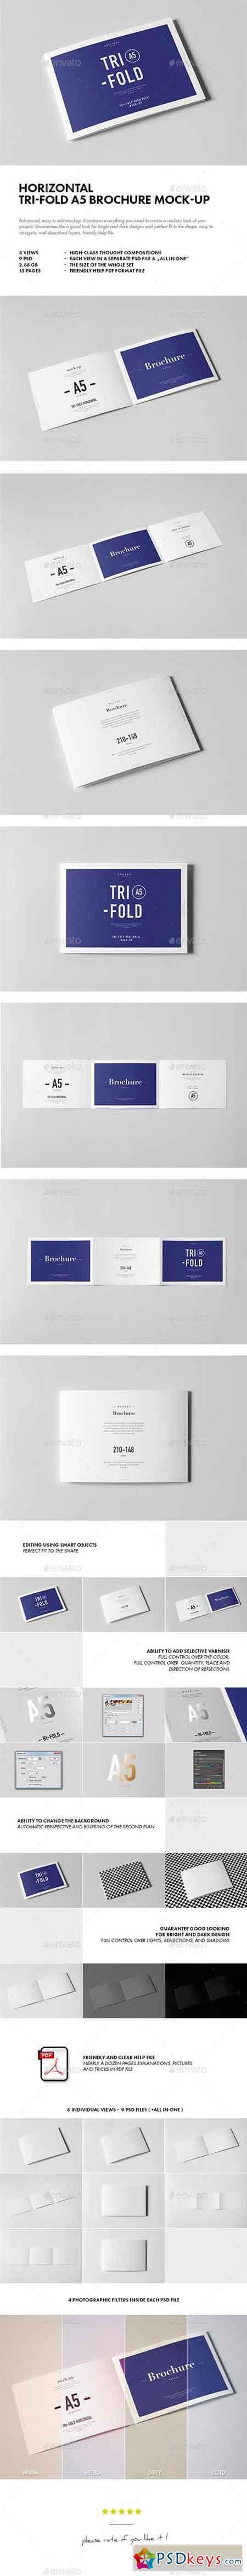 Horizontal Tri-Fold A5 Brochure Mock-up 18037533